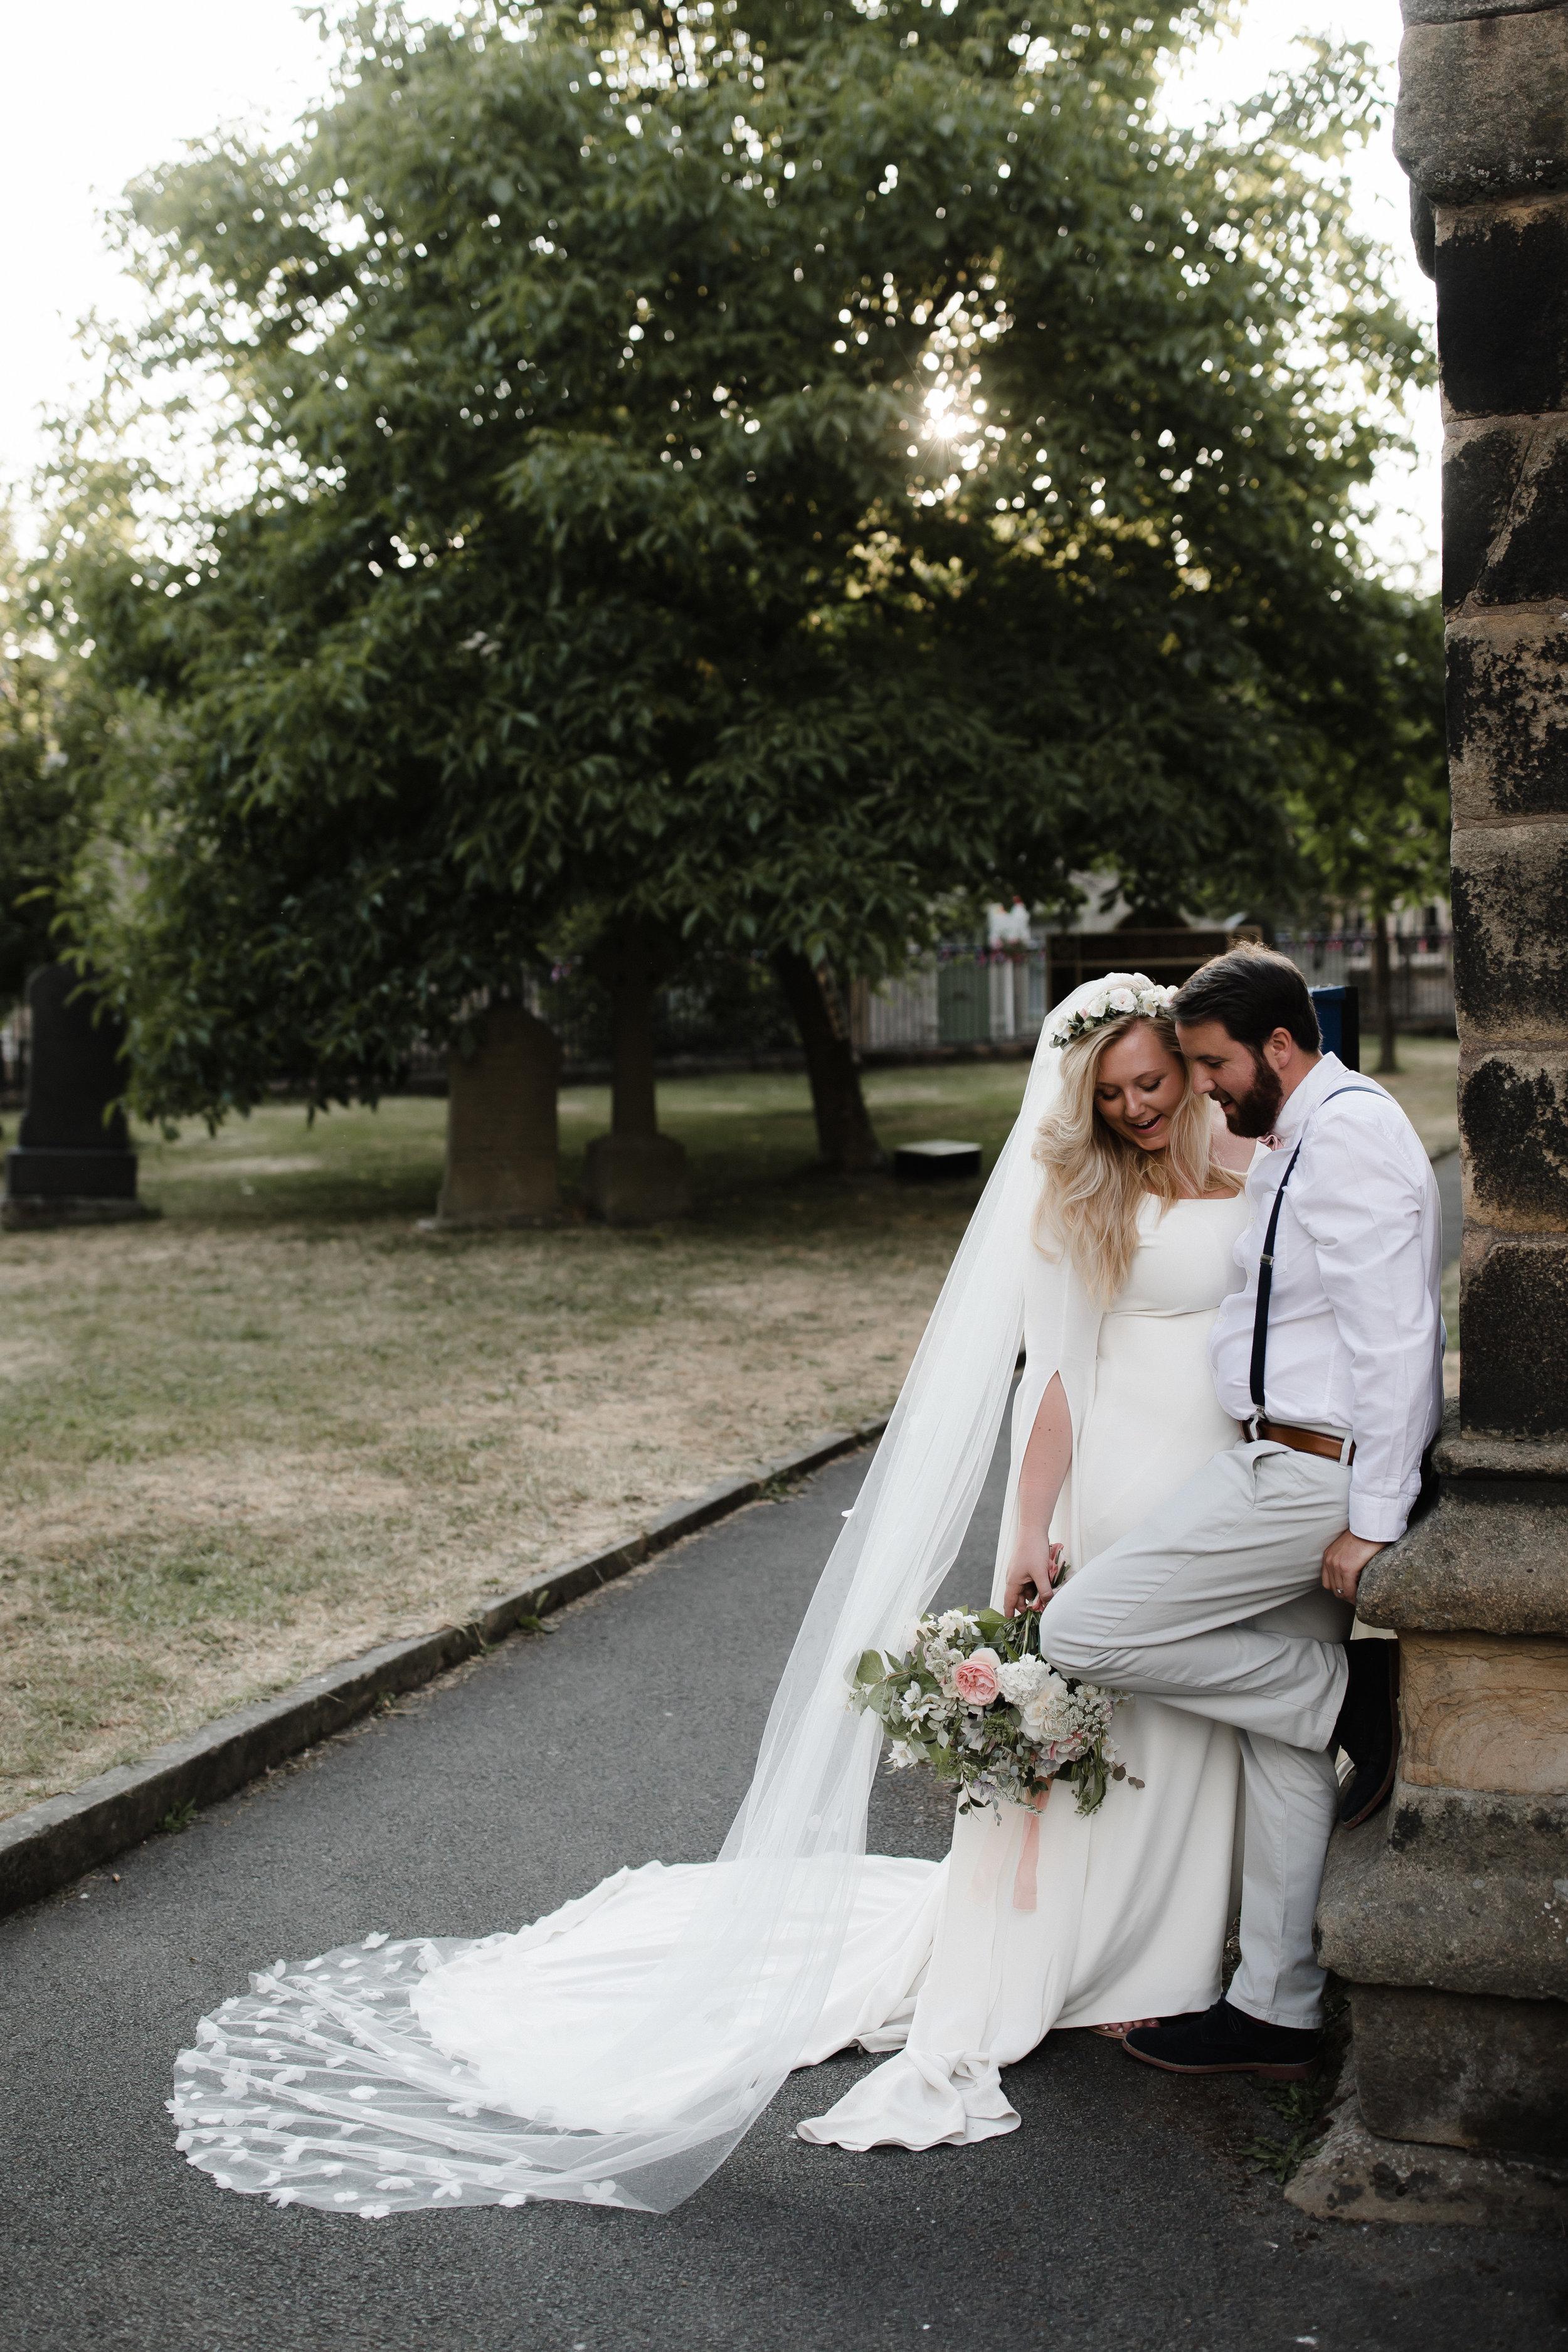 Lauren-Peak-District-Bespoke-Wedding-Gown-Petal-Veil-Train-Long-Sleeve-Susanna-Greening-Designs-Matlock-Derbyshire-1